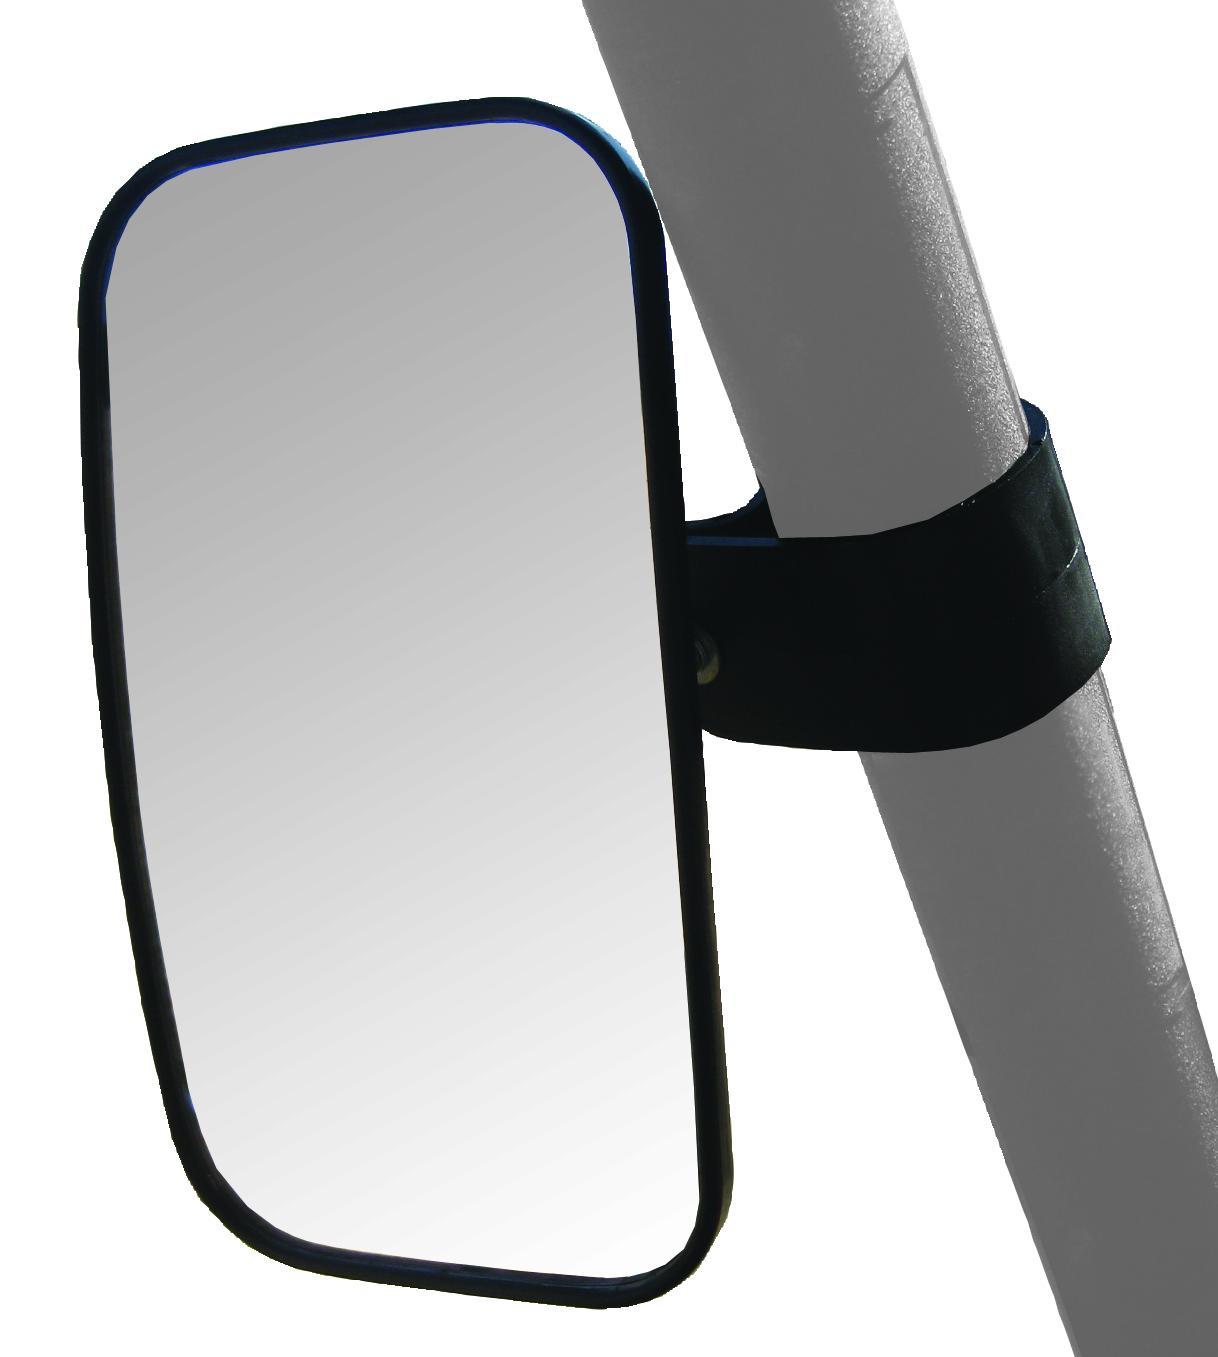 Utv Rear View Mirror >> Utv Universal Side Rearview Mirror 2 Round Tube And 1 875 Round